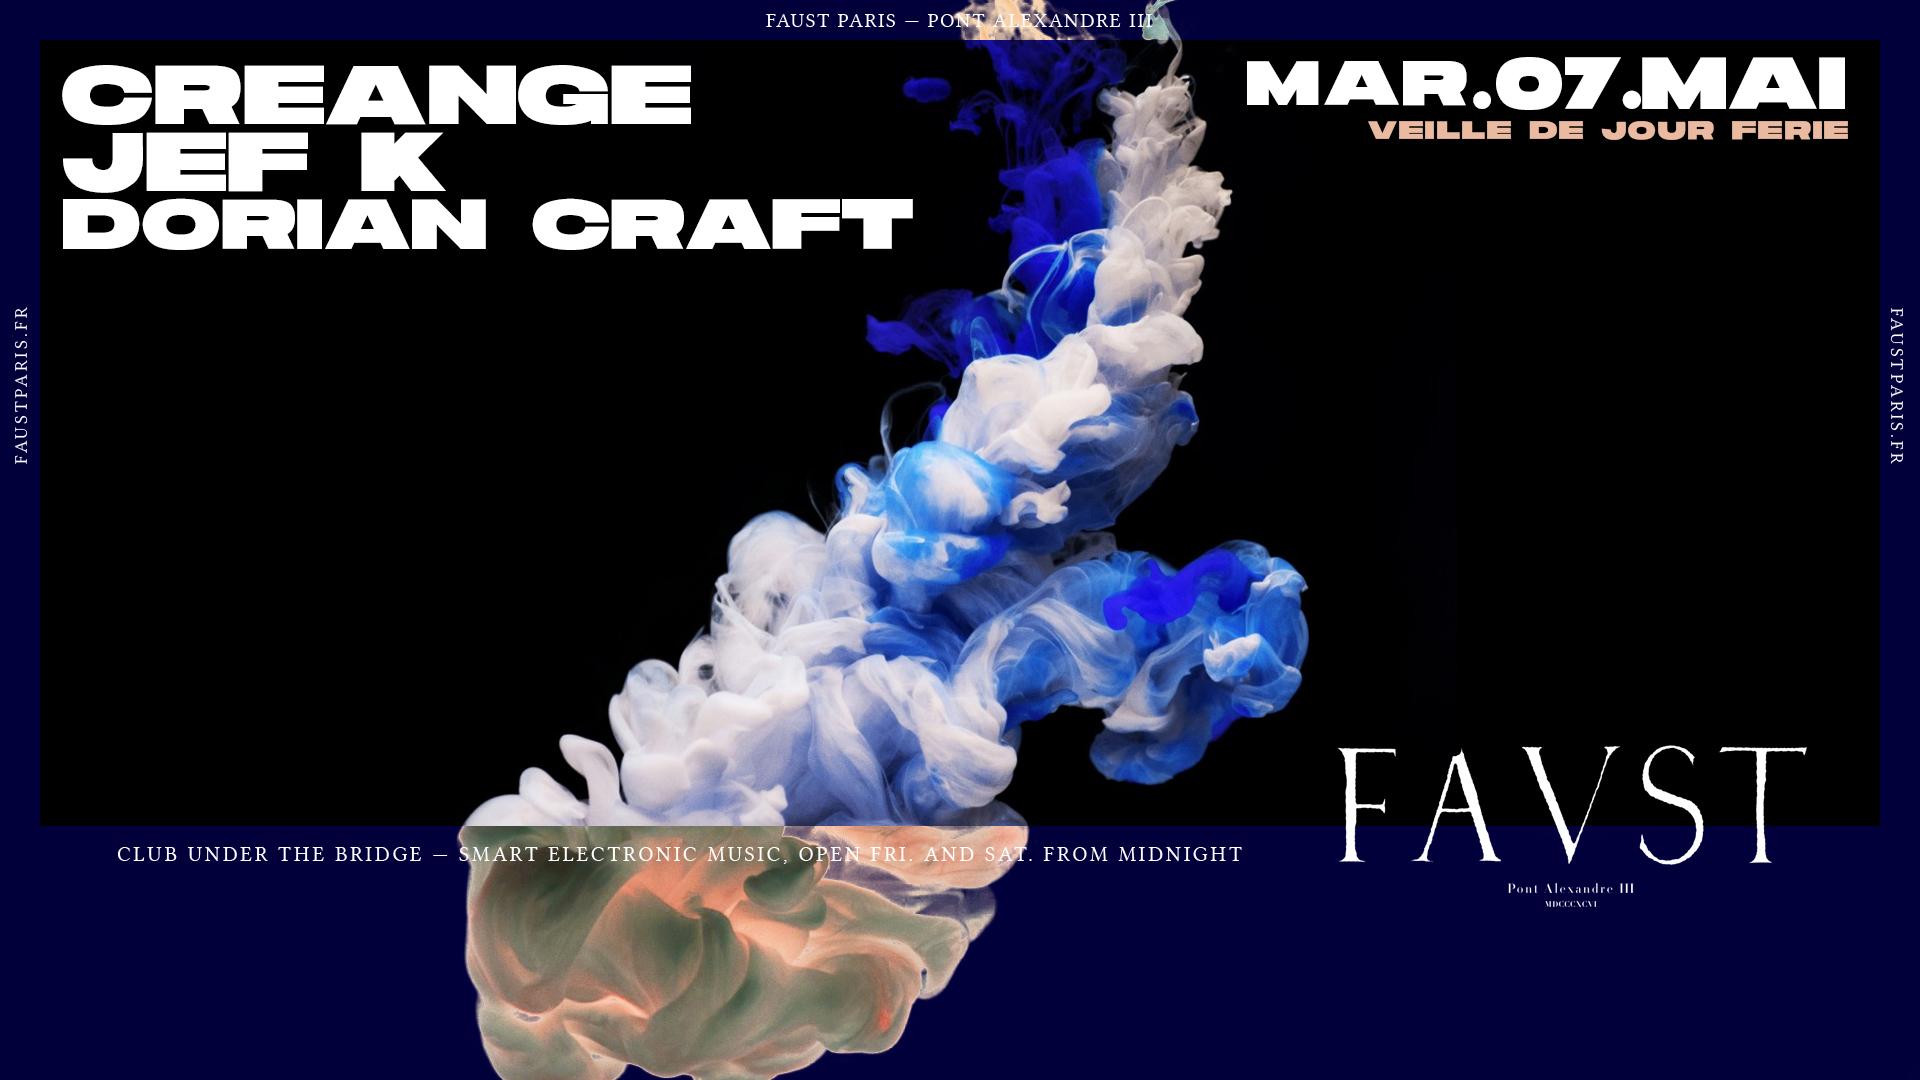 Faust — Mardi : Creange, Jef K, Dorian Kraft